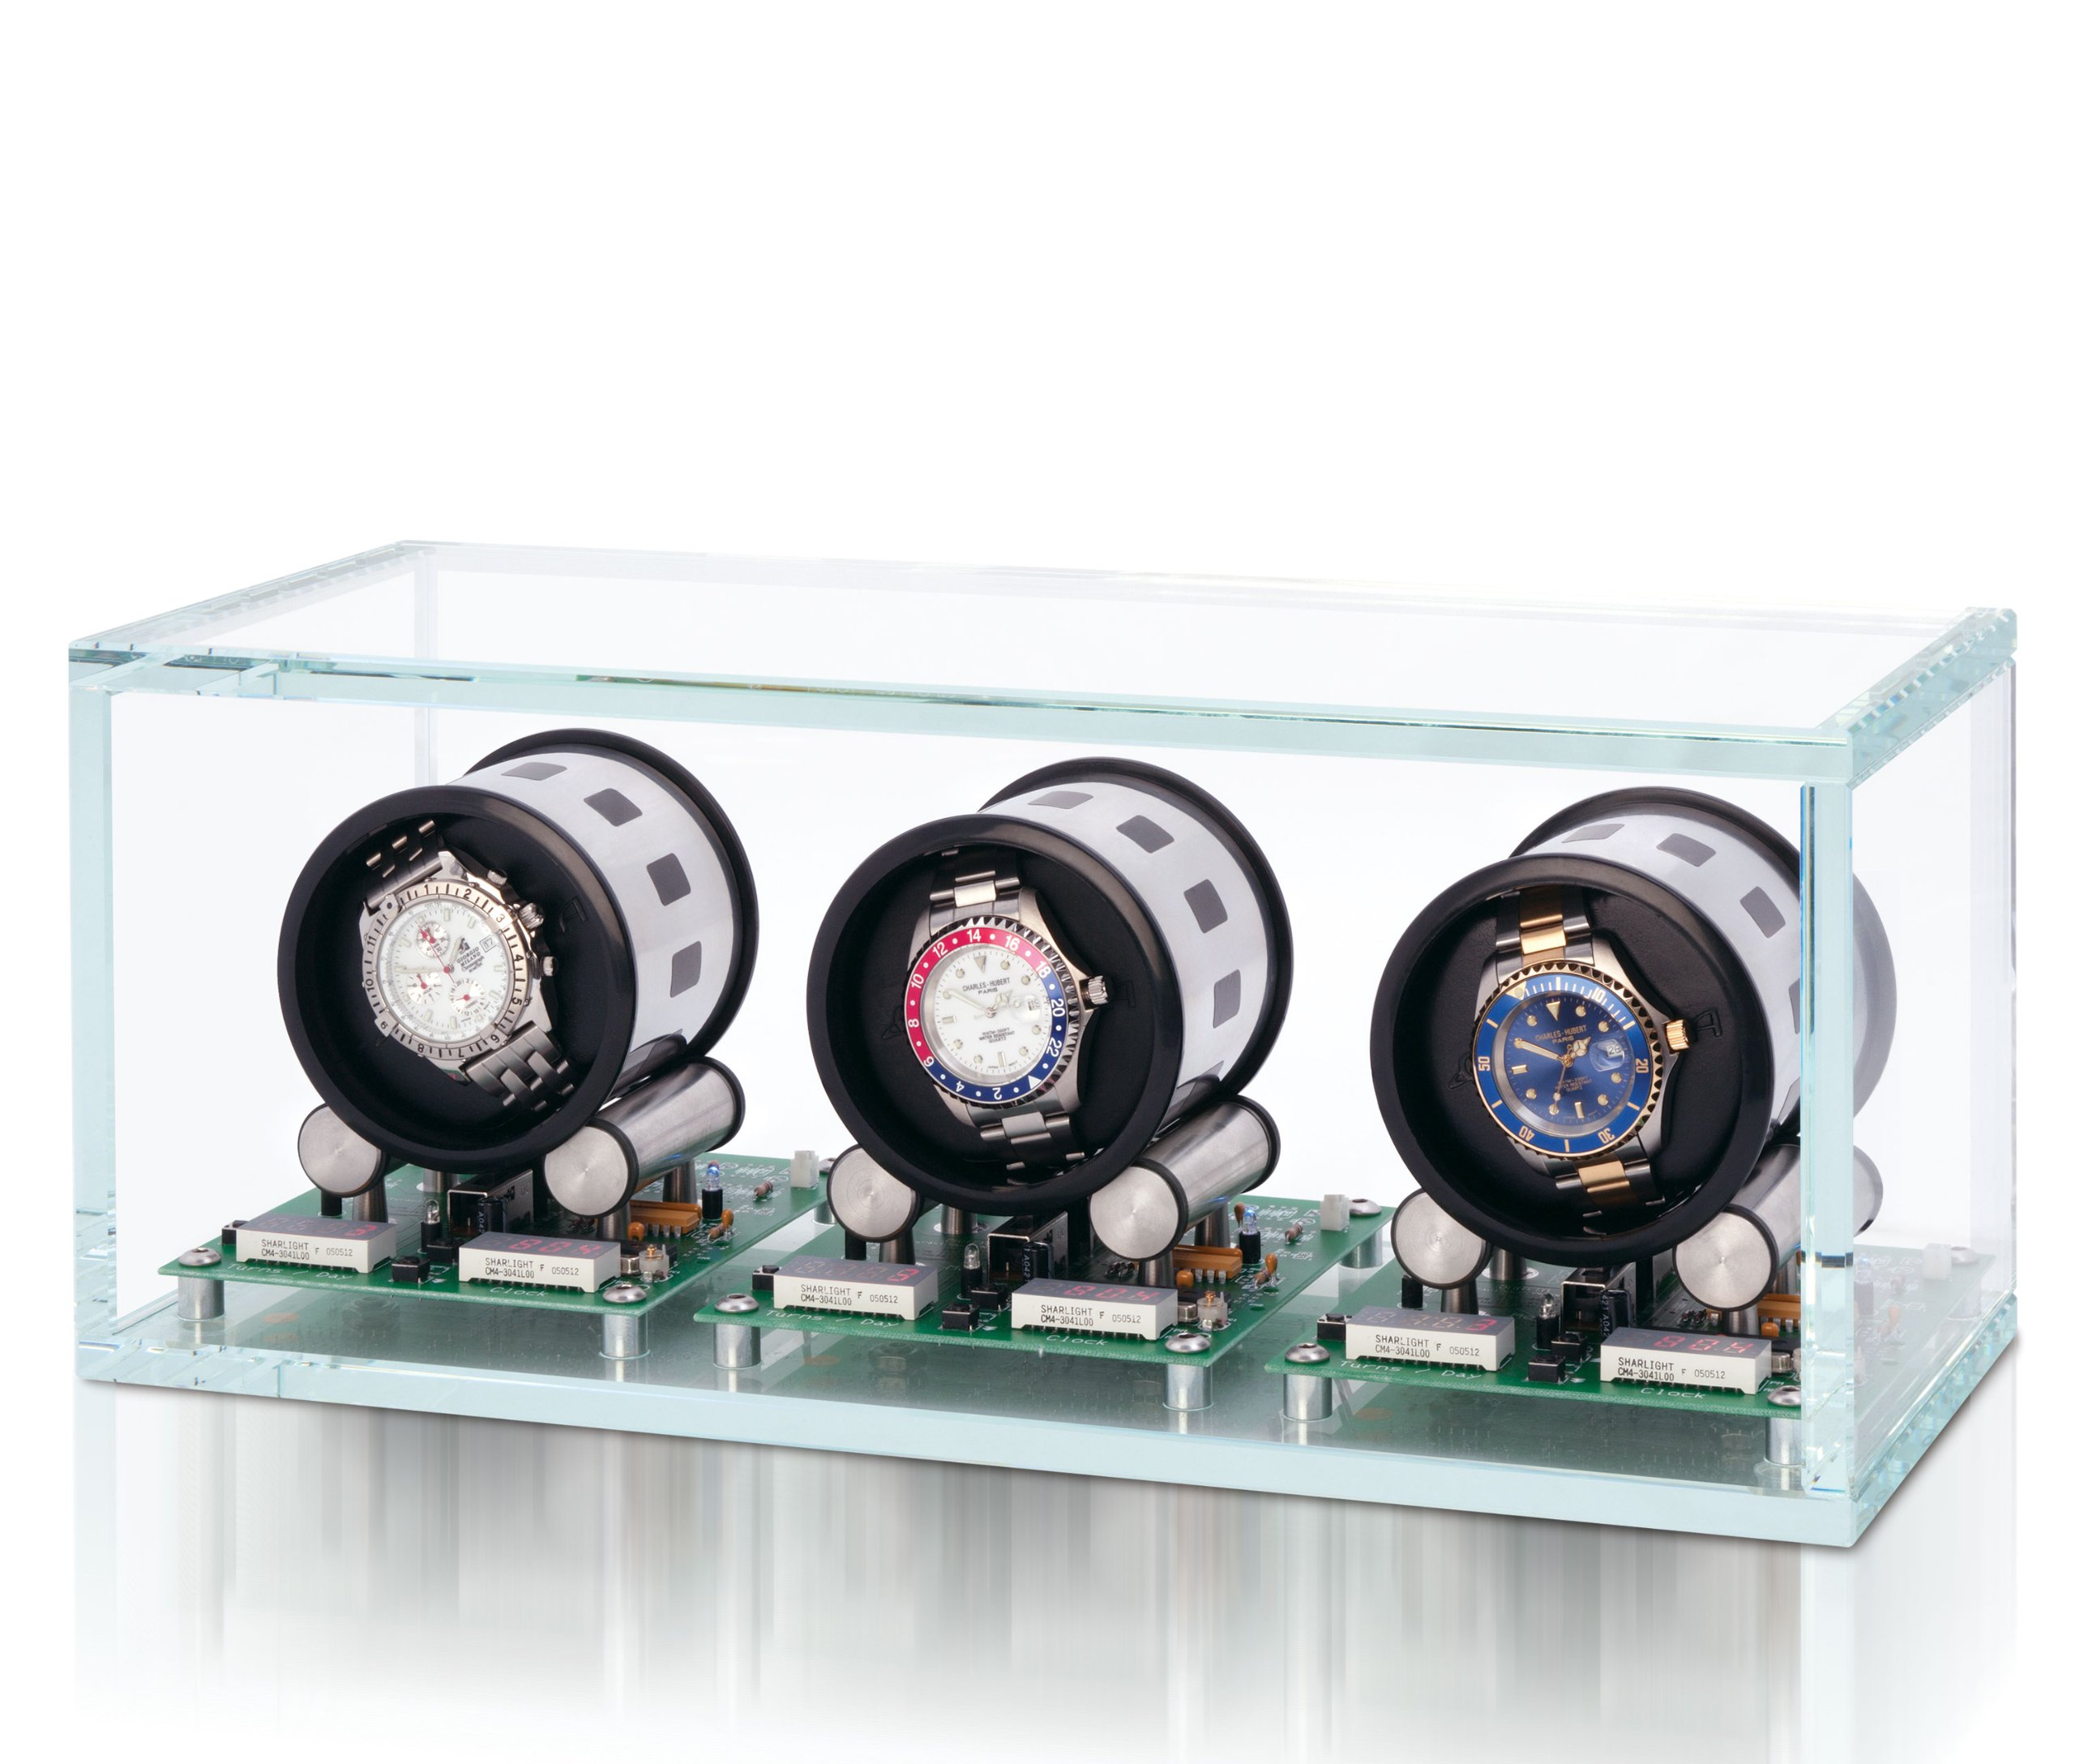 Tourbillon 3 Watch Winder by Orbita Model W35003